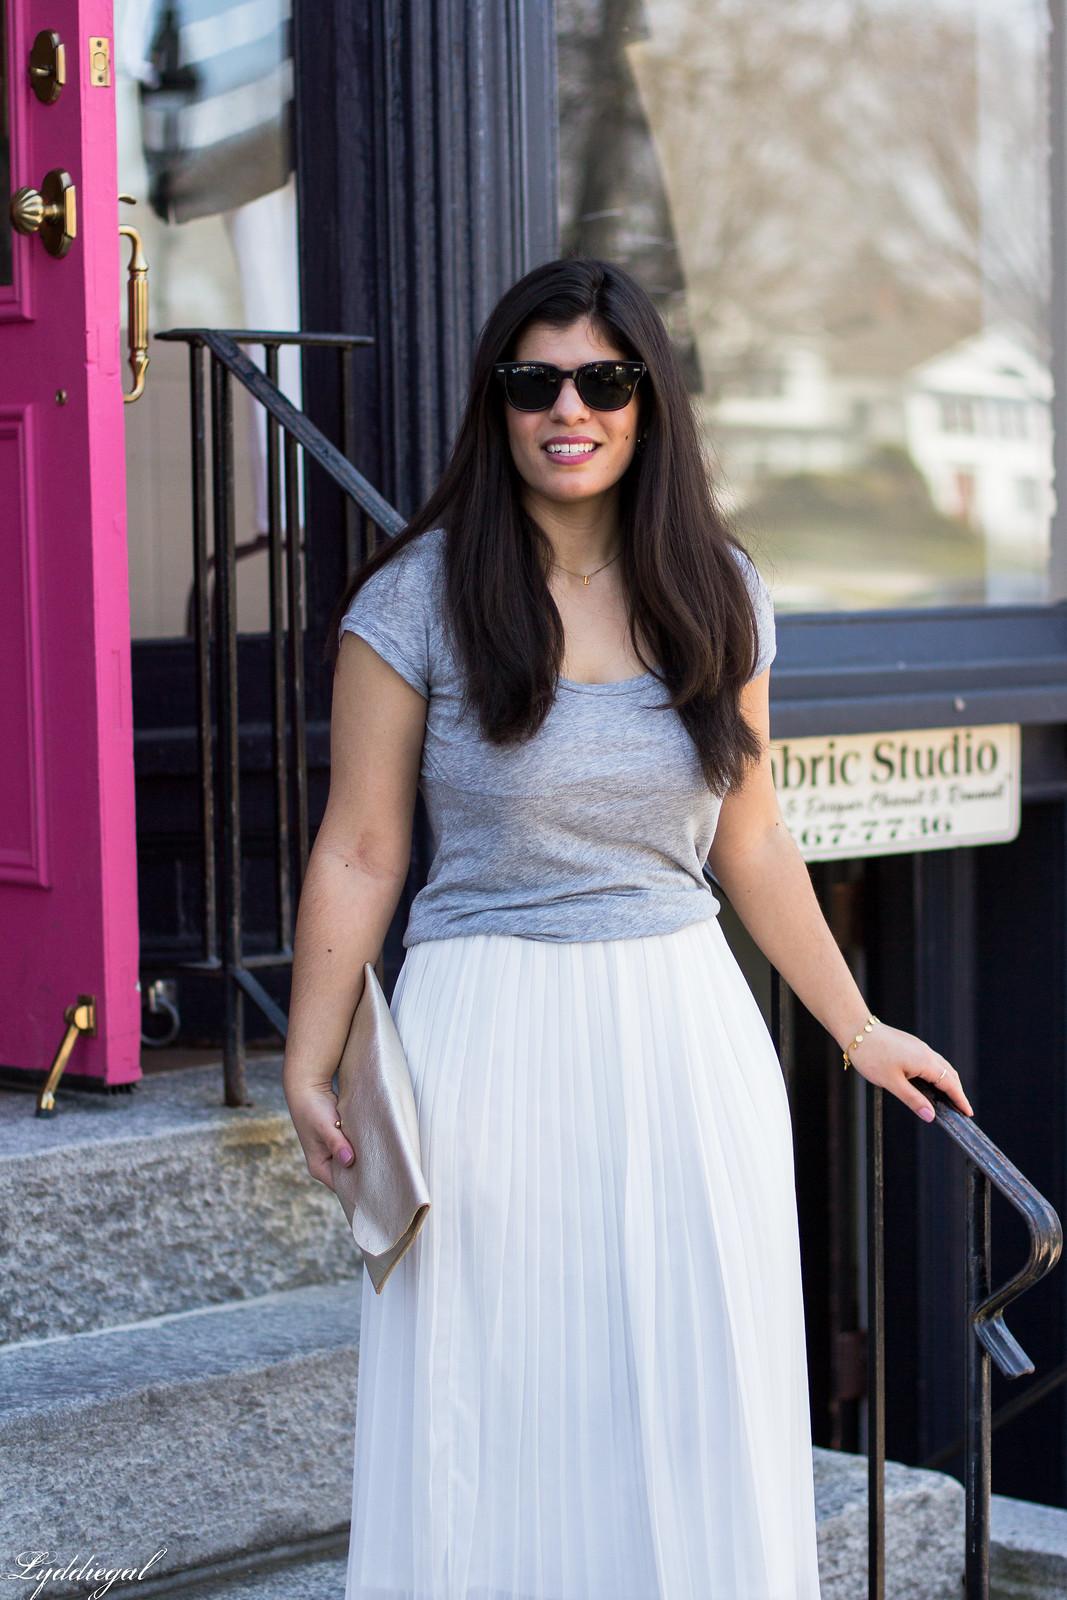 white pleated midi skirt, grey tee, nude heels, scalloped clutch-1.jpg